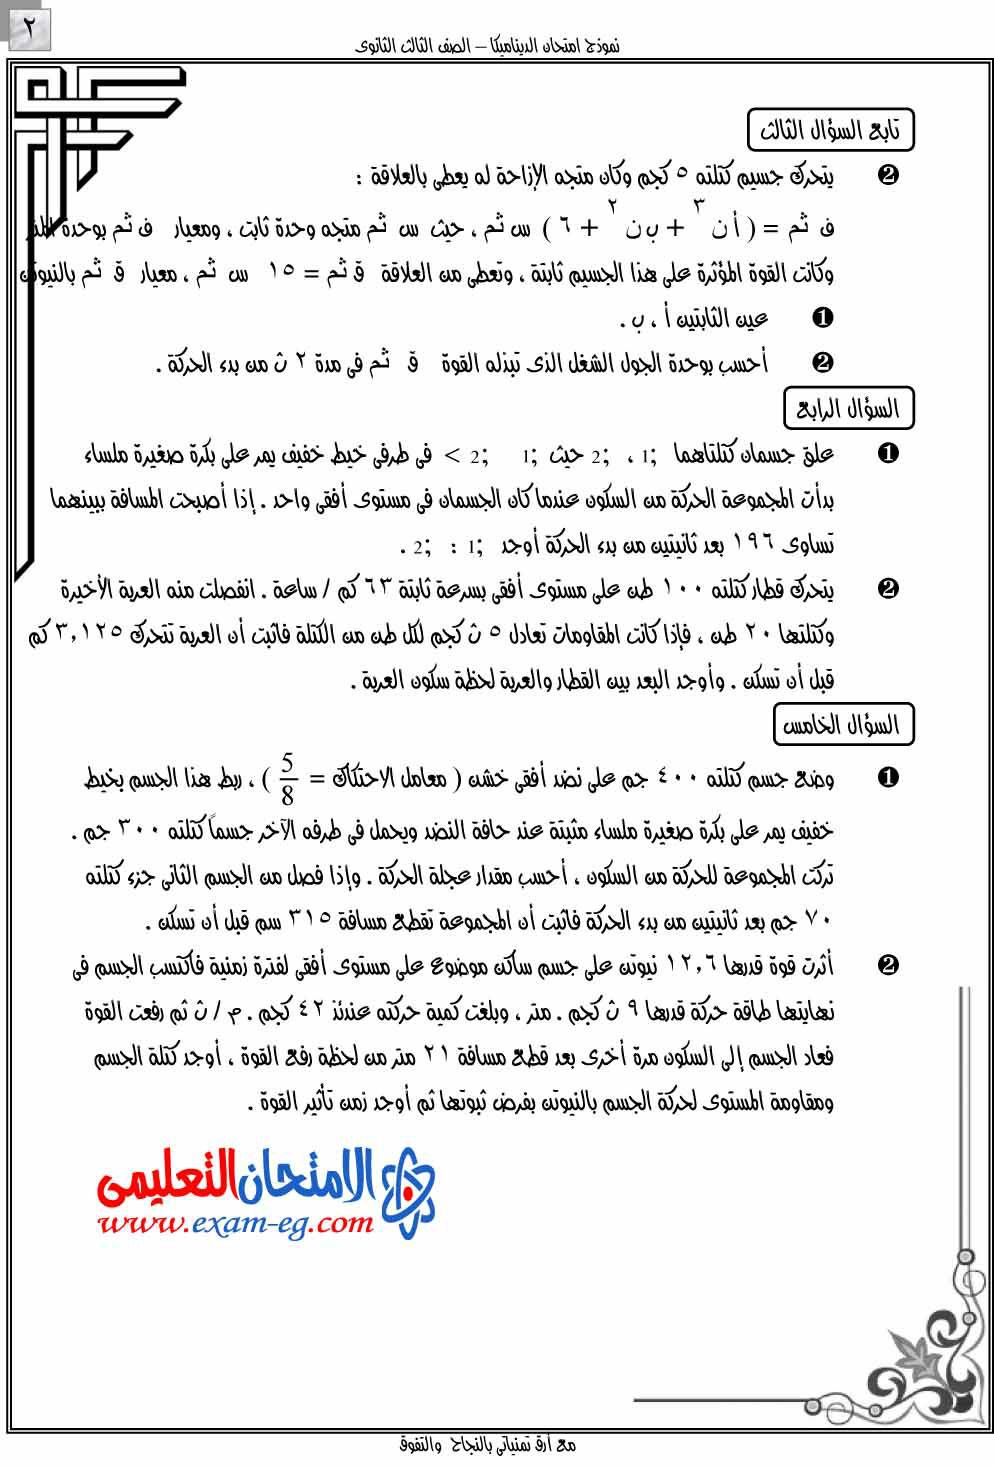 exam-eg.com_1403332950412.jpg